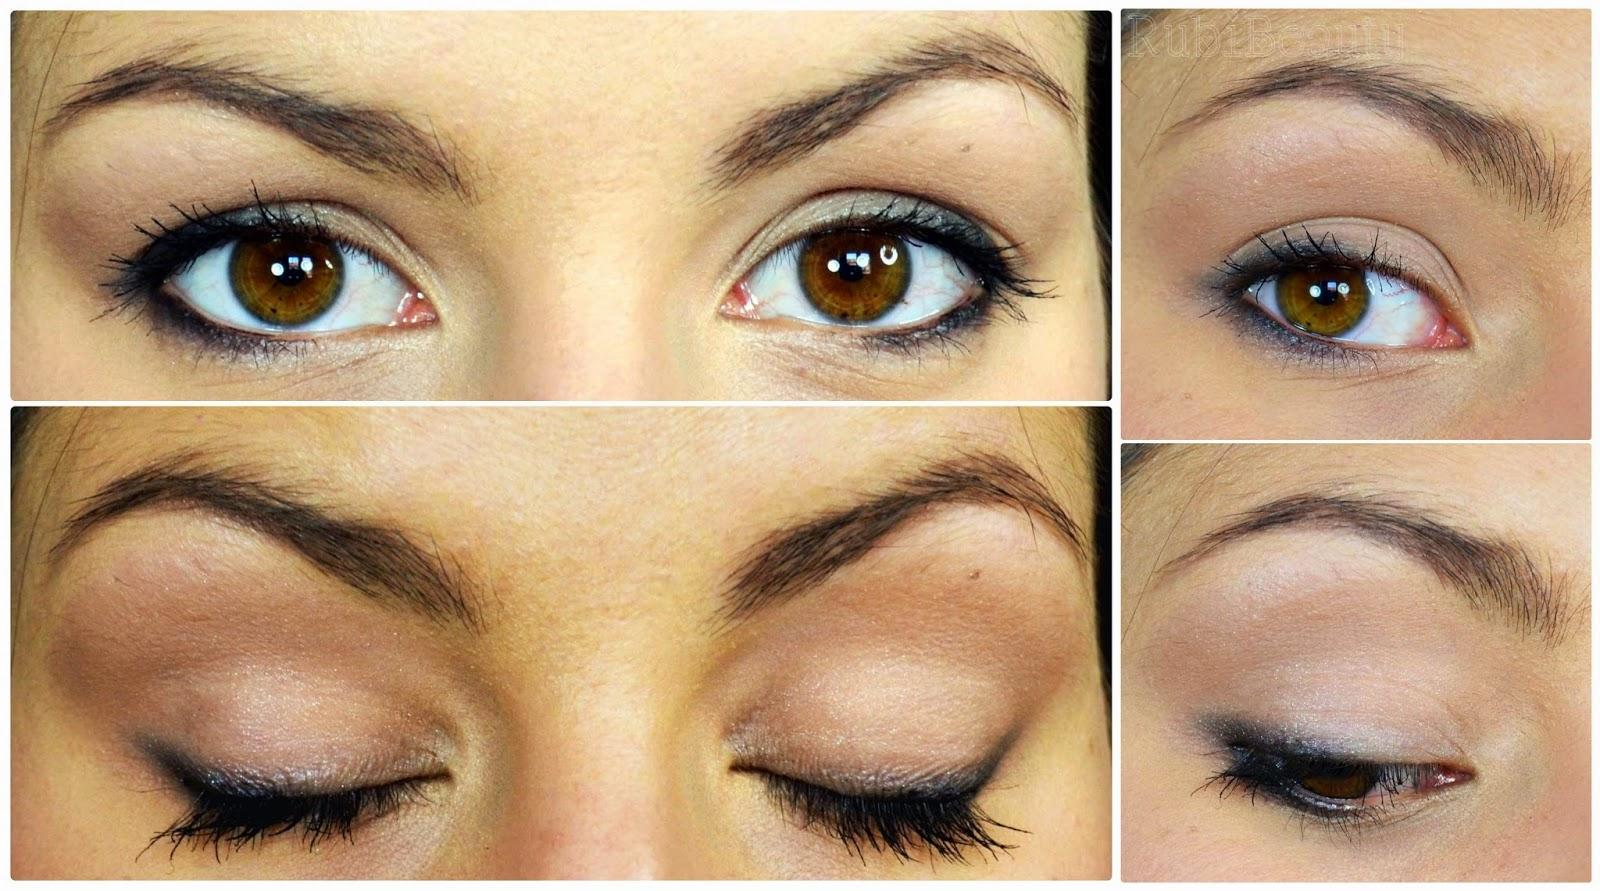 rubibeauty maquillaje emma watson ojos sencillo